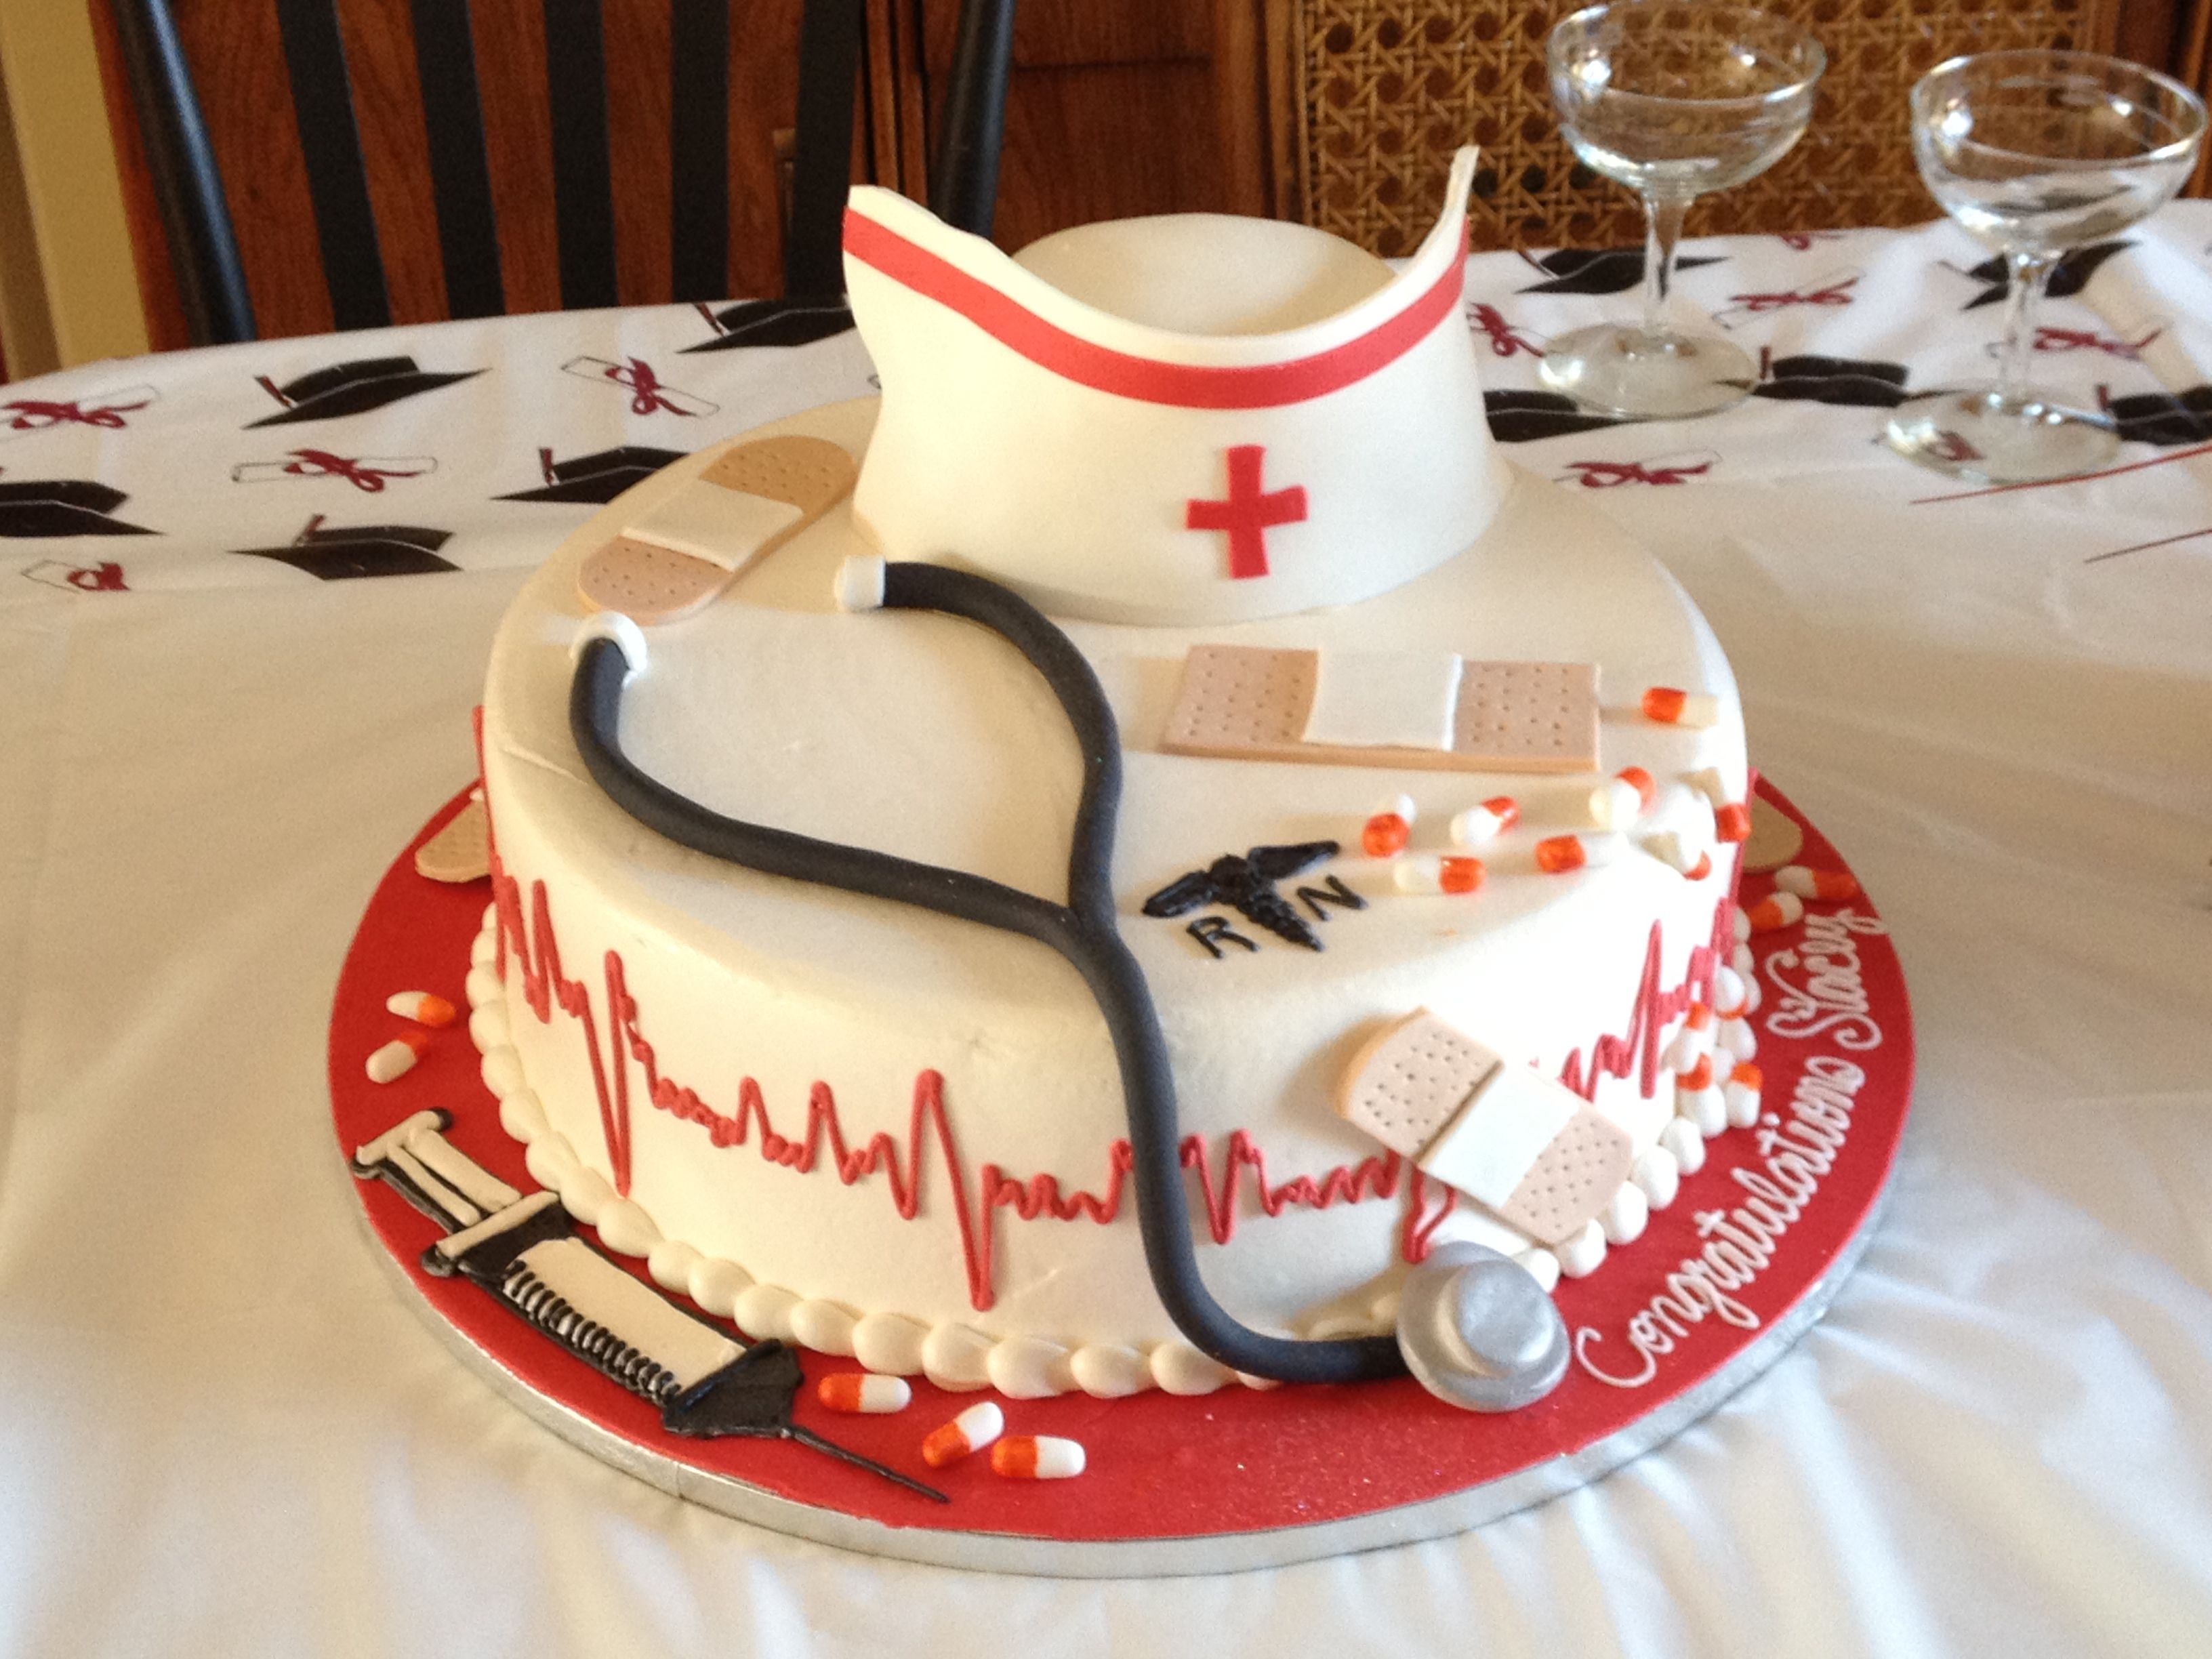 Nursing School Graduation Cake I Would Love This When I Graduate